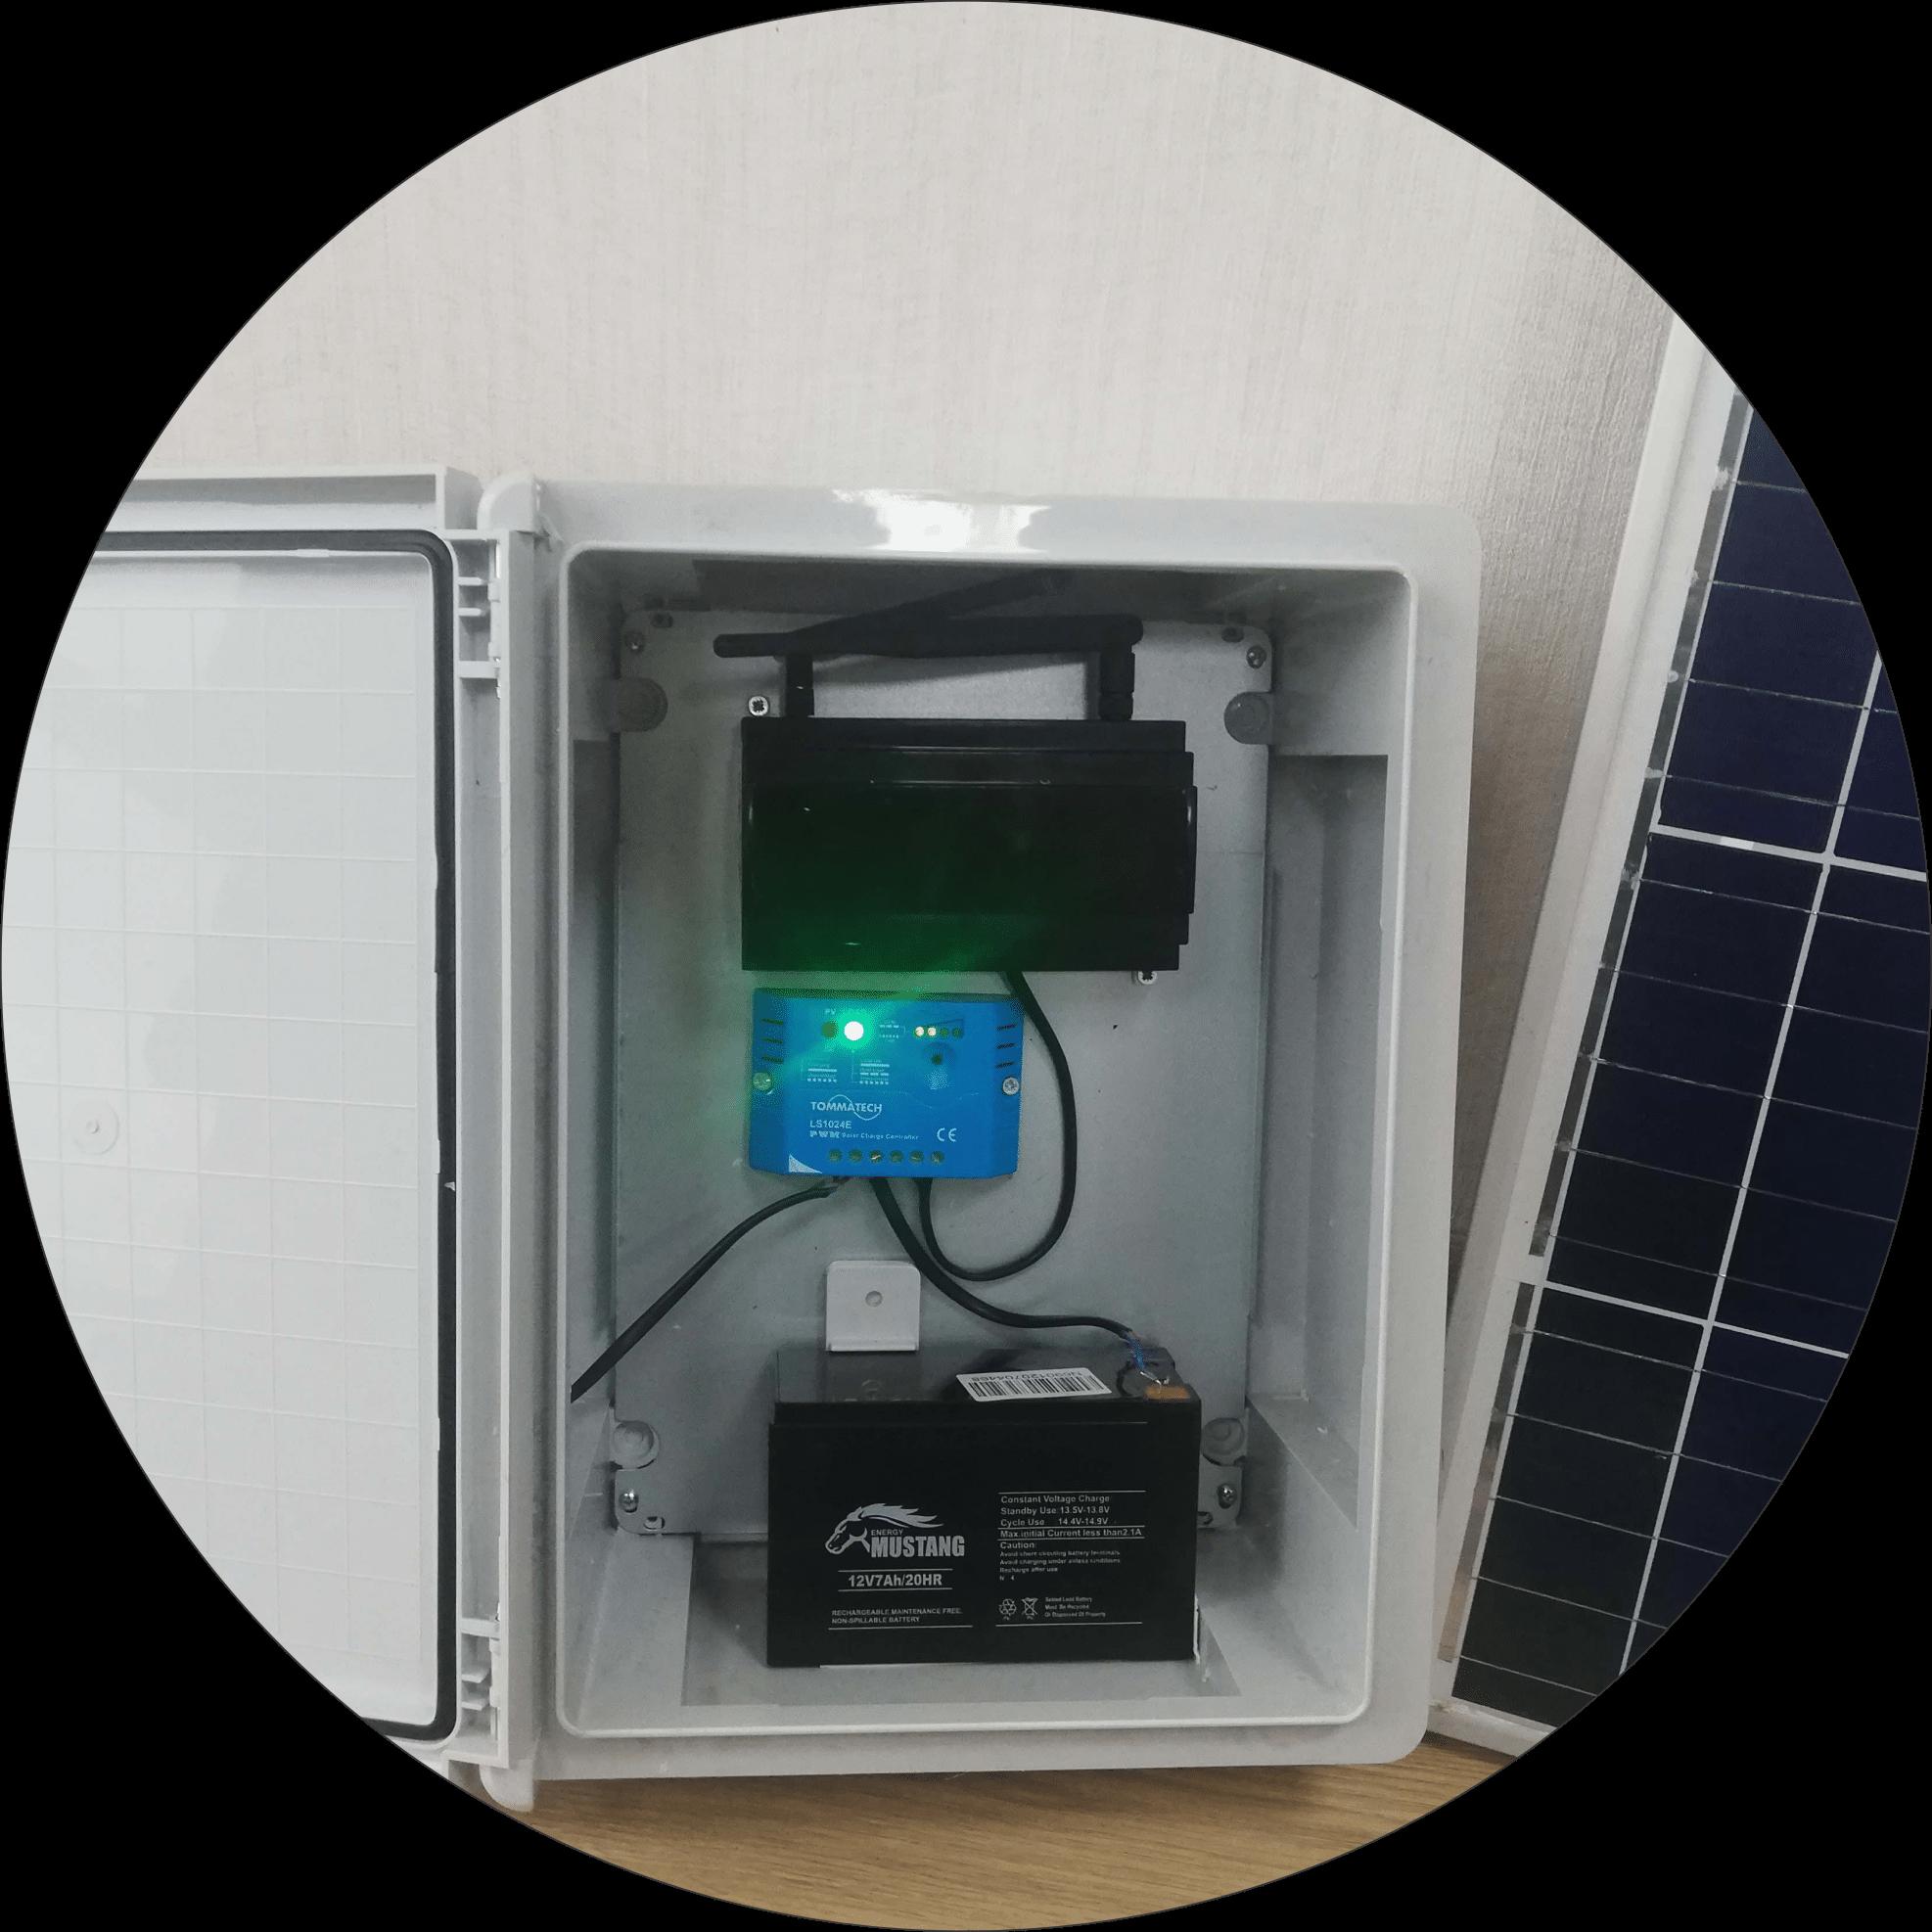 Kablosuz sulama sistemi kontrol ünitesi